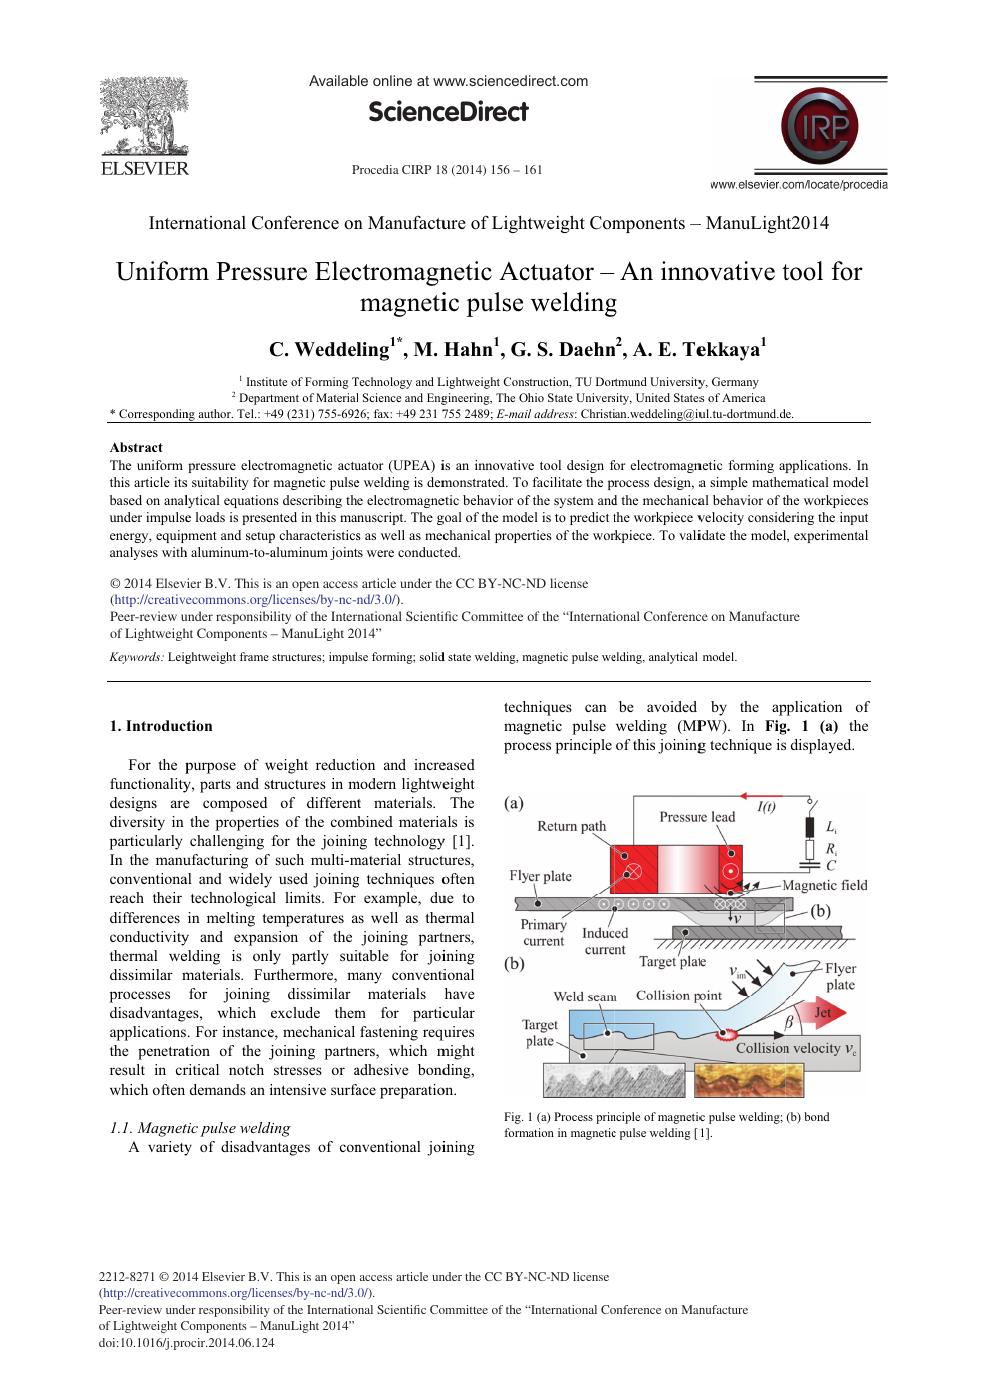 Uniform Pressure Electromagnetic Actuator – An Innovative